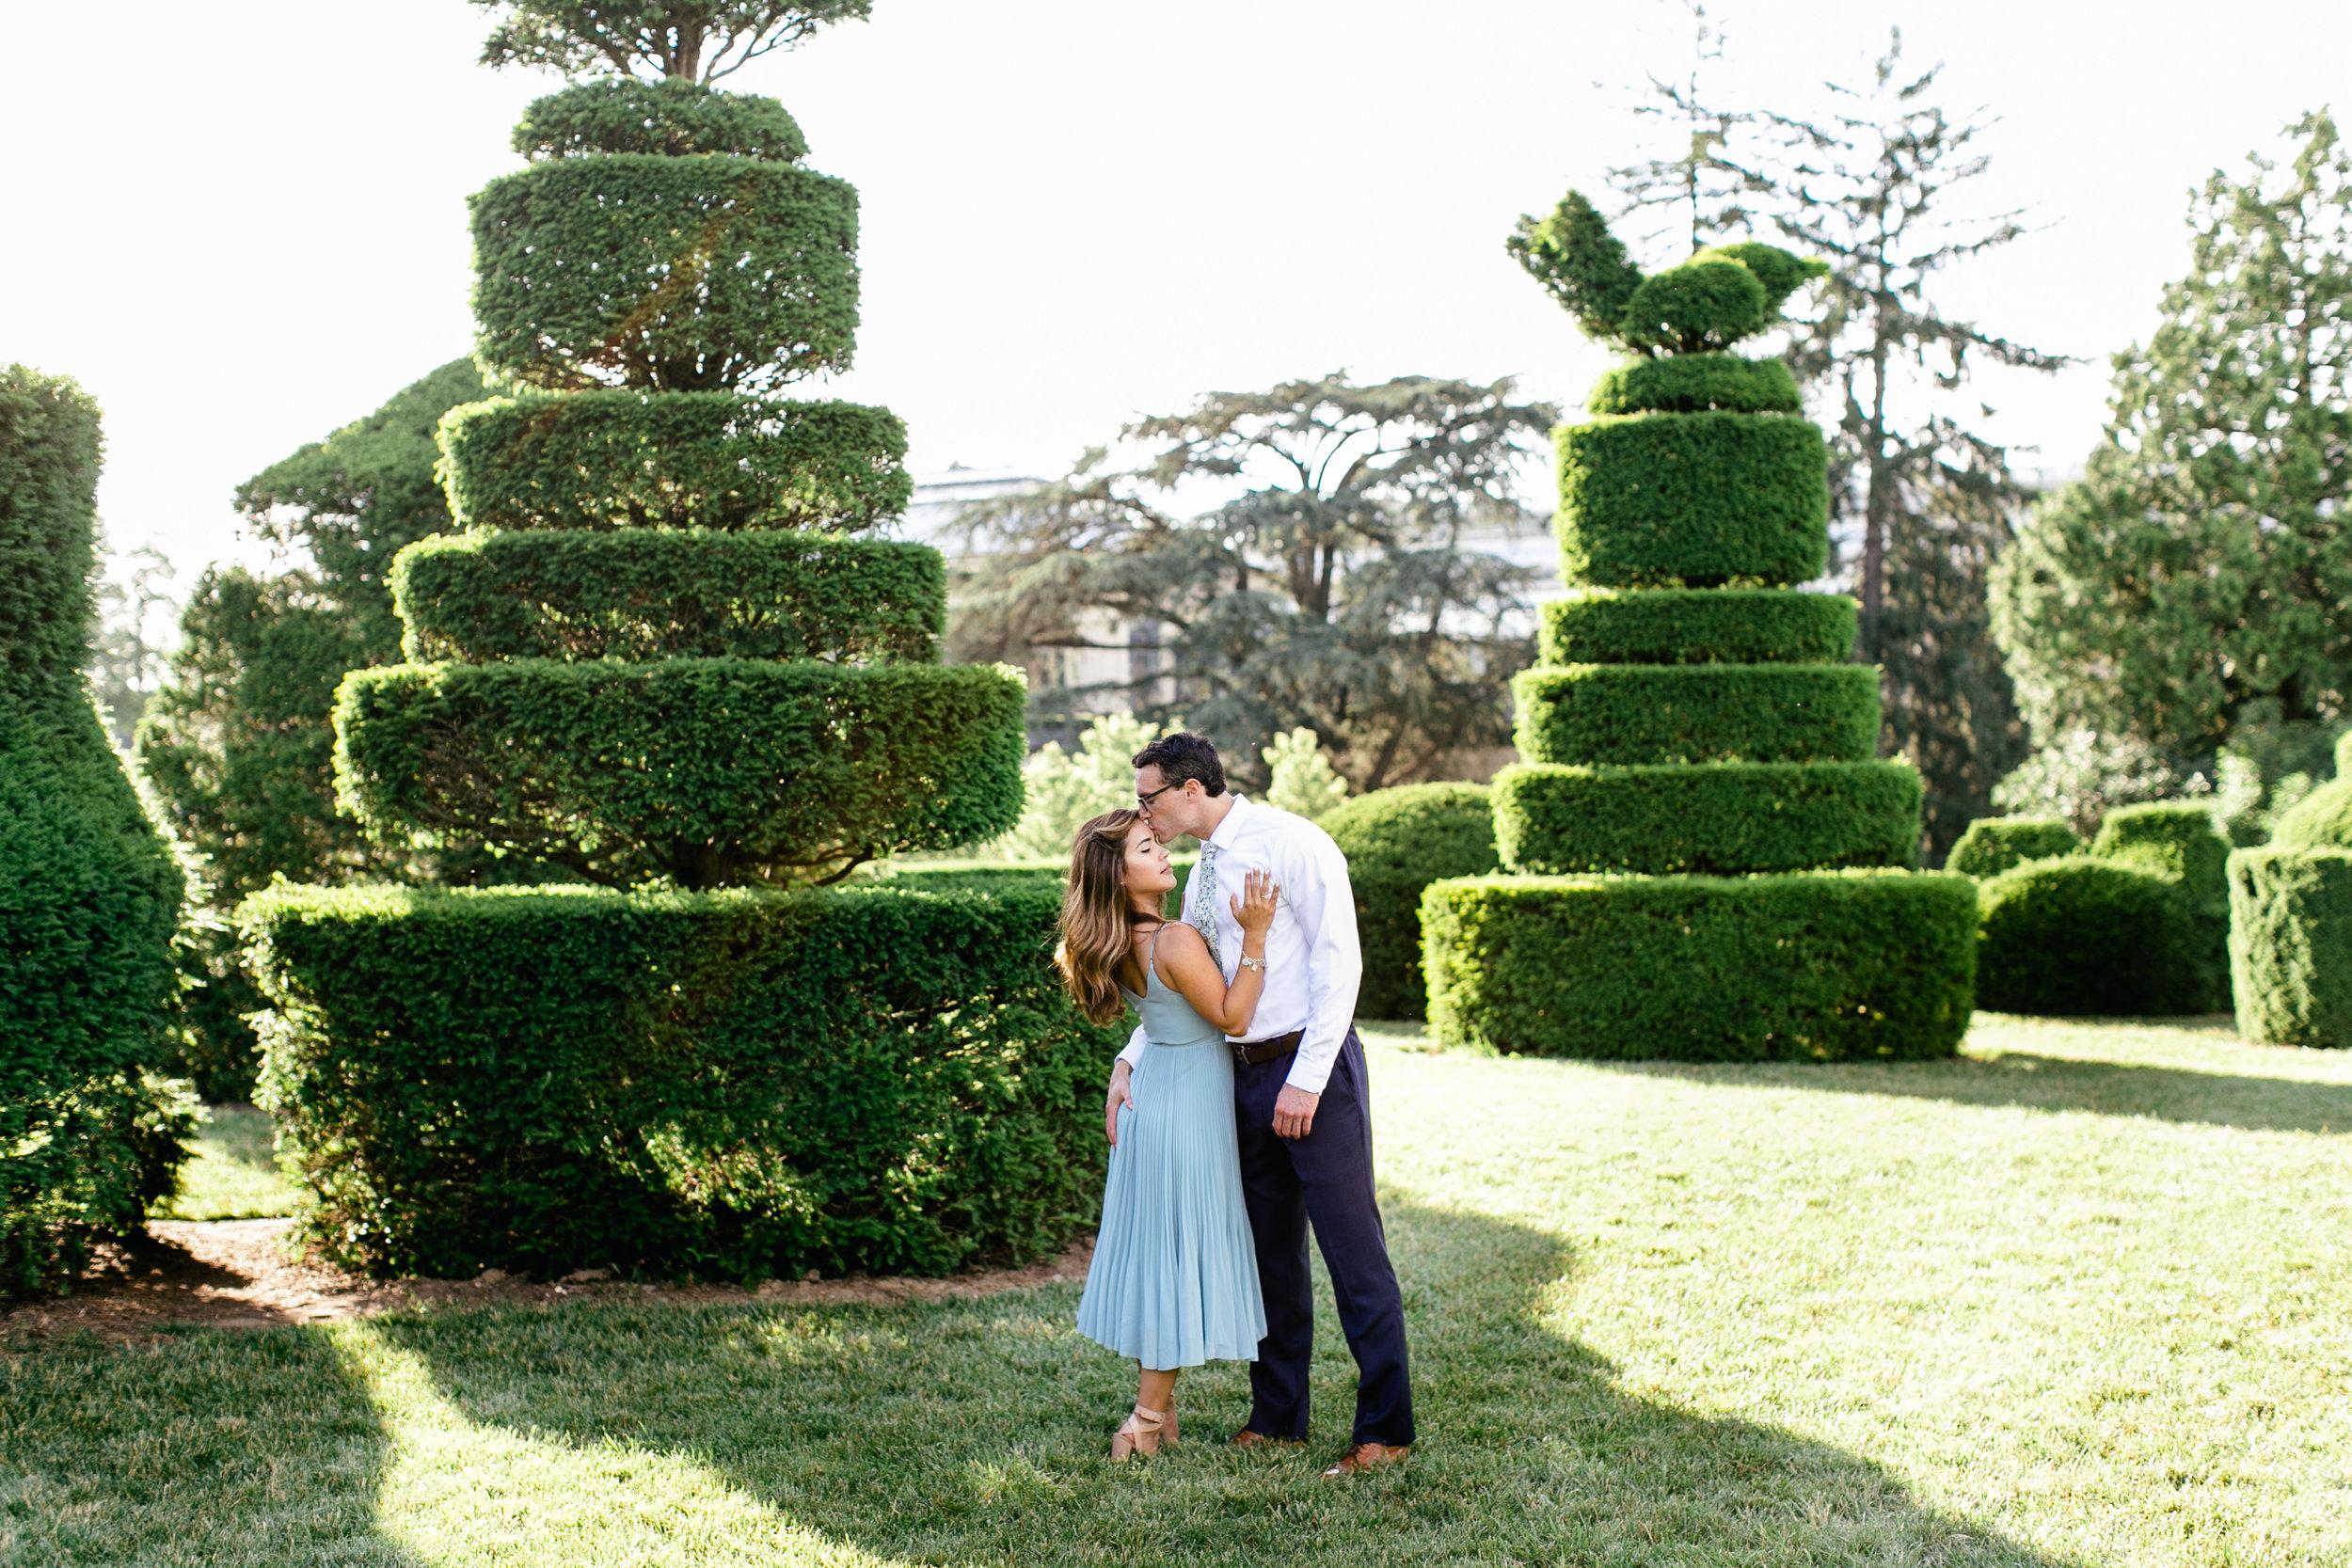 photography-natural-candid-engaged-proposal-philadelphia-wedding-longwood gardends-nature-flowers-modern-lifestyle-17.JPG